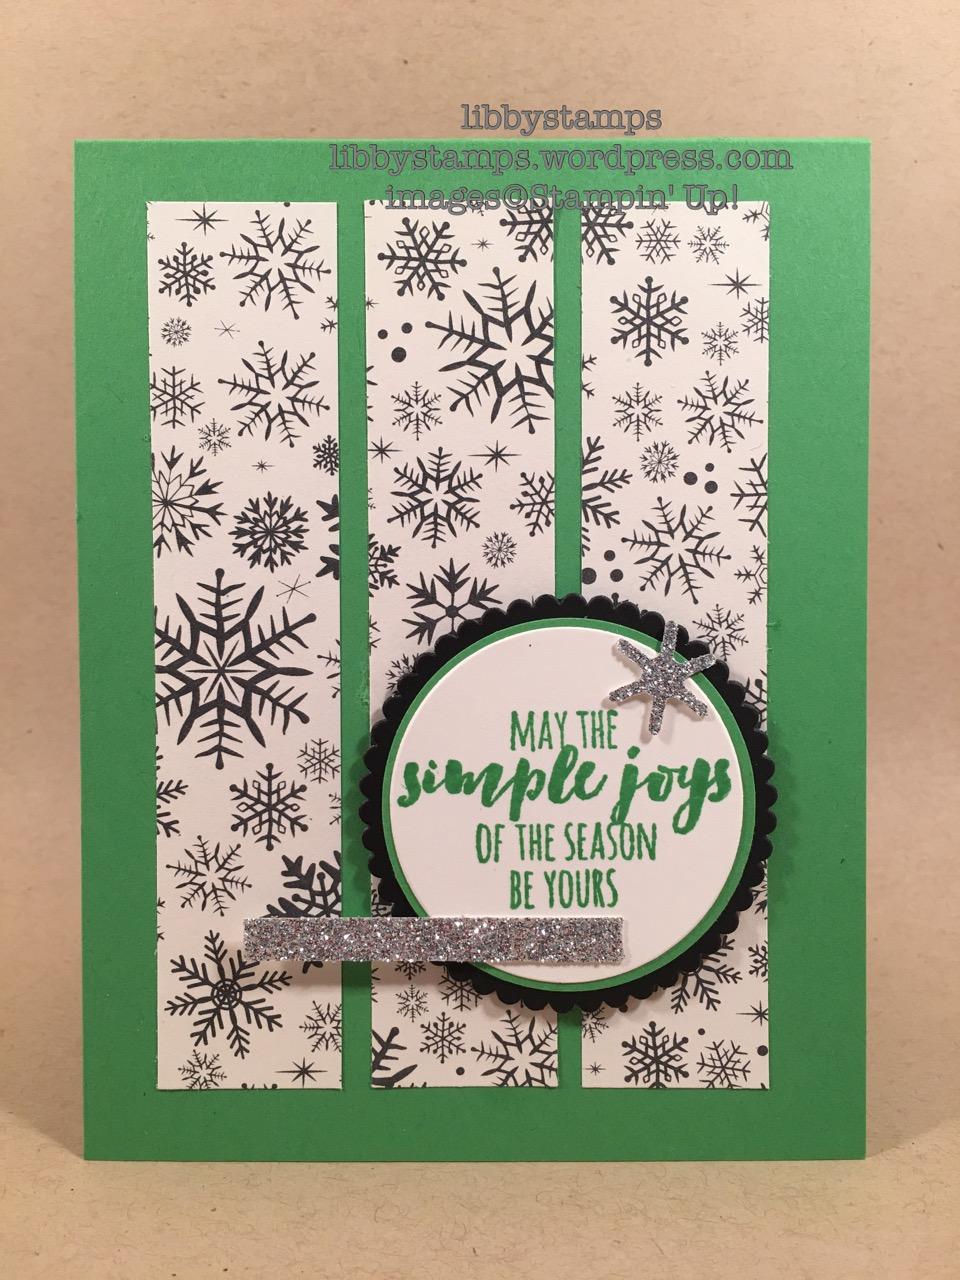 libbystamps, stampin up, Christmas Pines, Botanical Builder Framelits, Layering Circles Framelits, This Christmas DSP, TSOT#301, Christmas